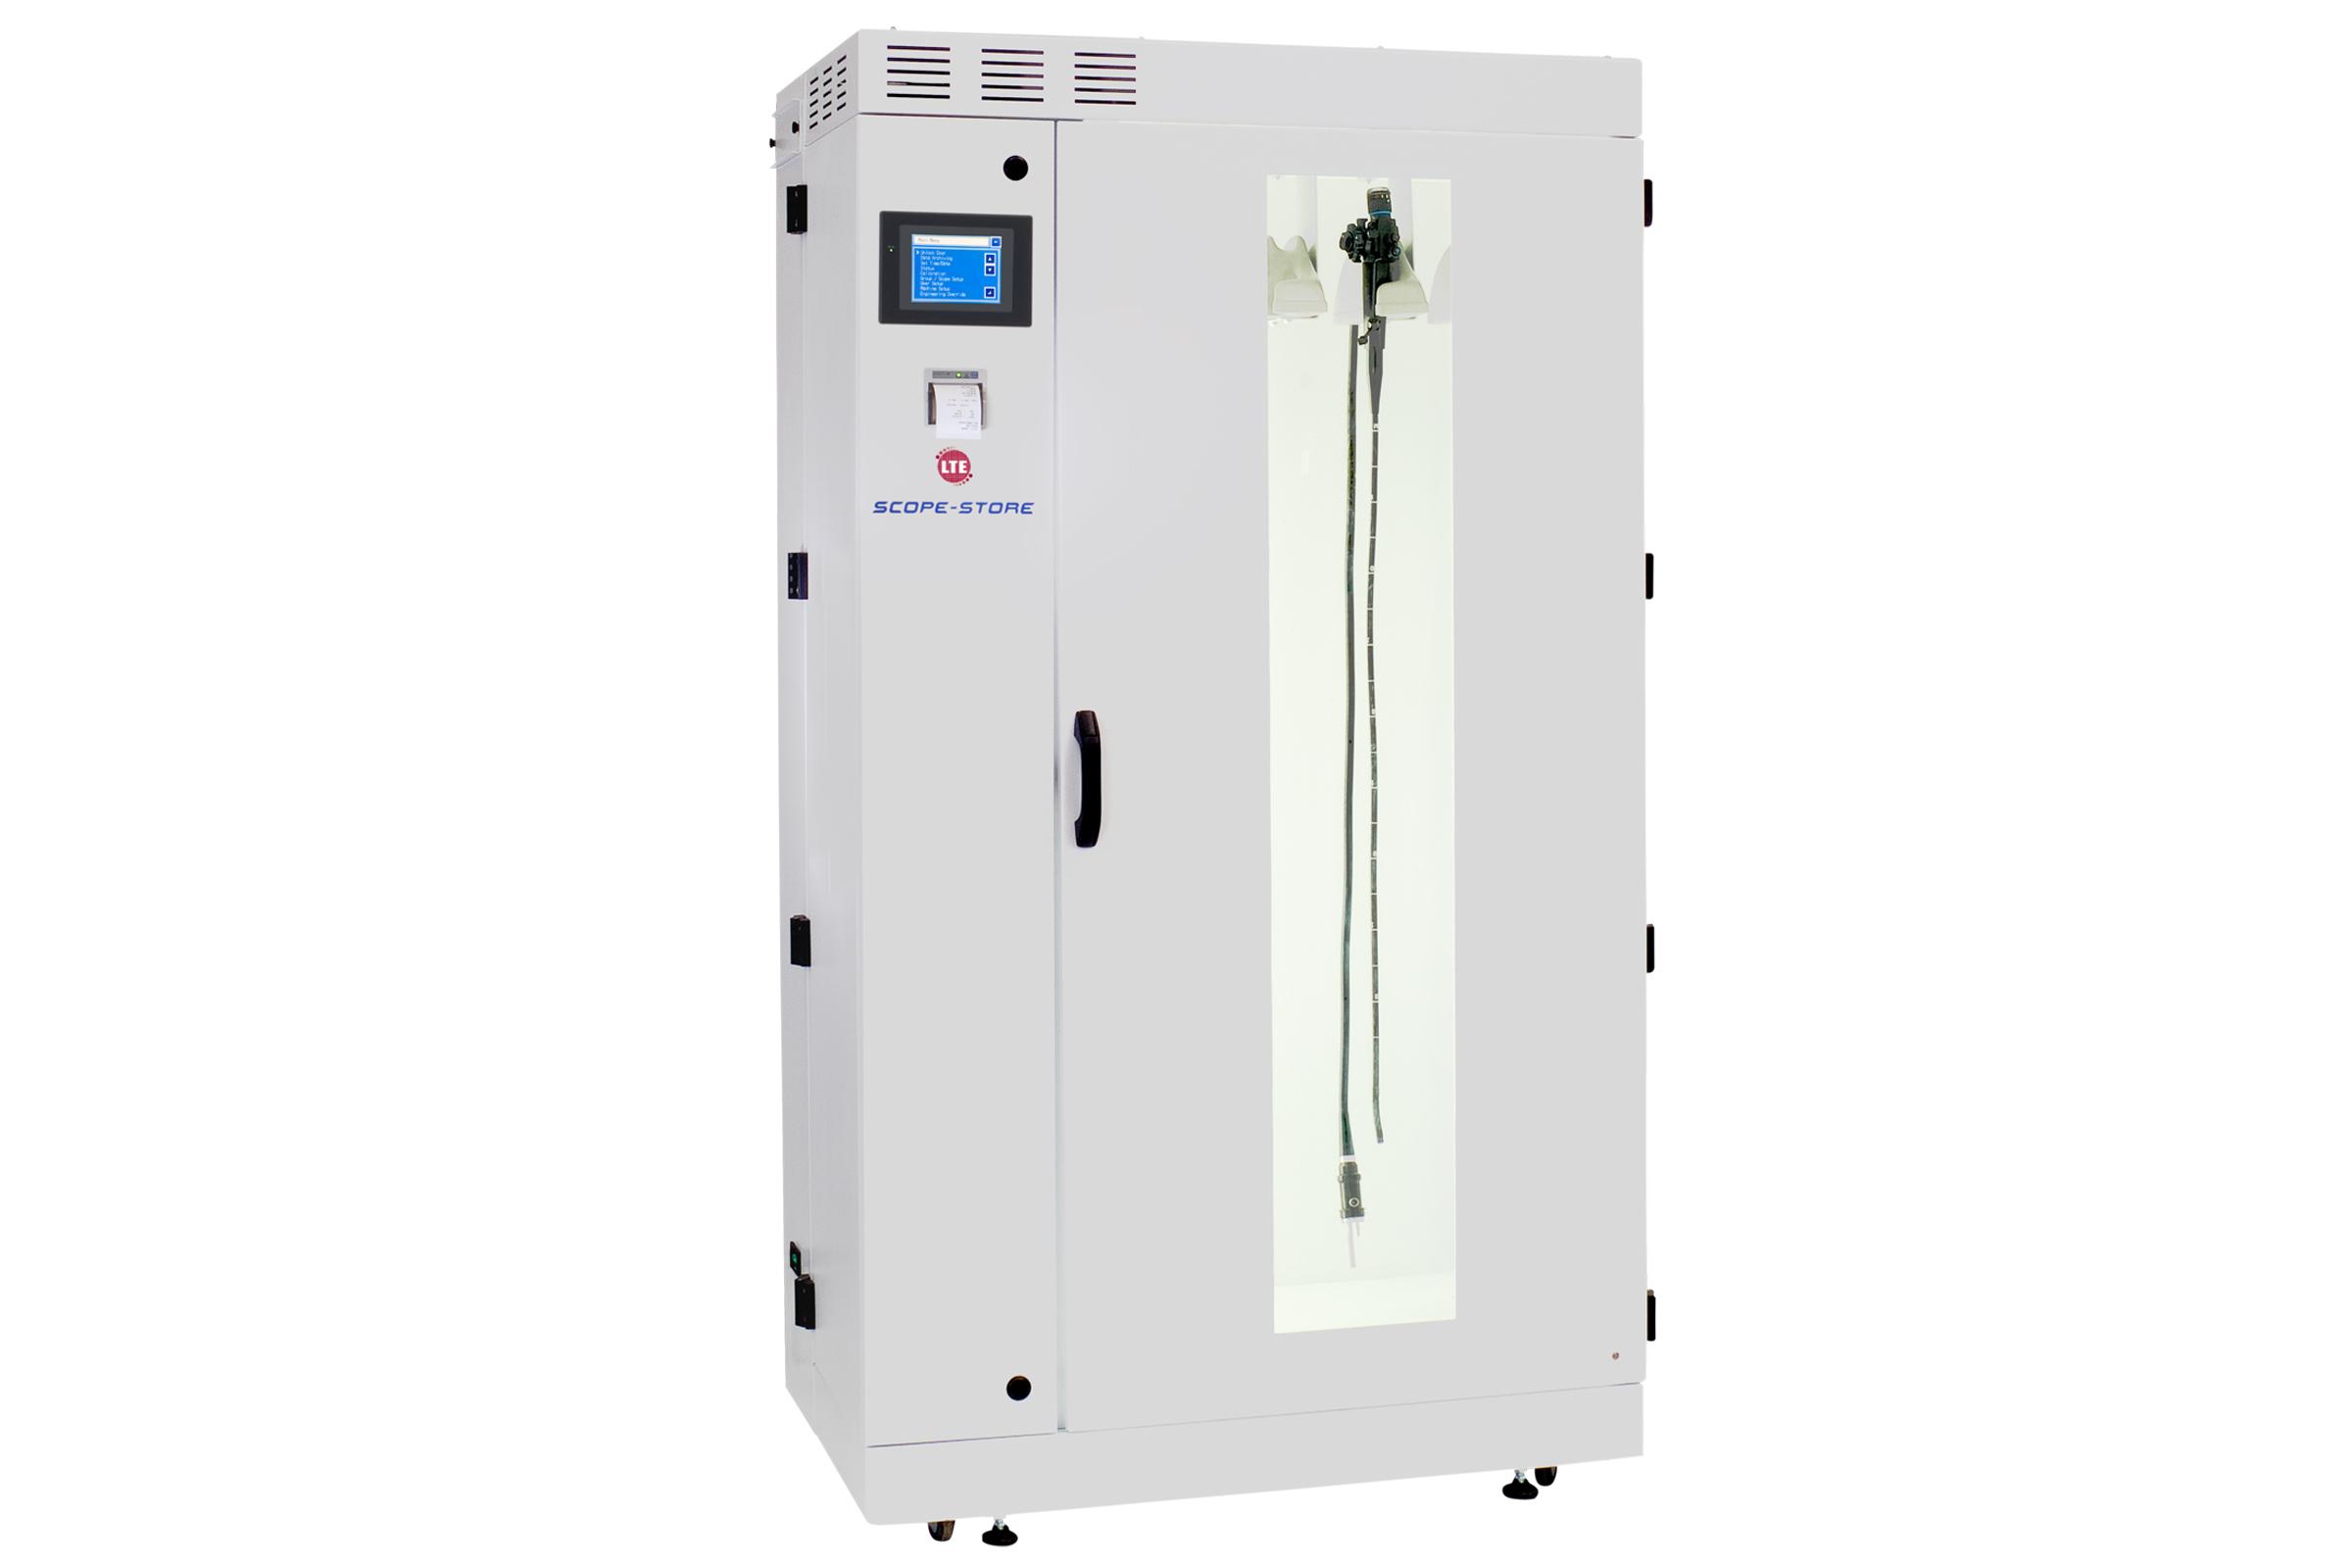 Scope-Store + Endoscope Storage Cabinets